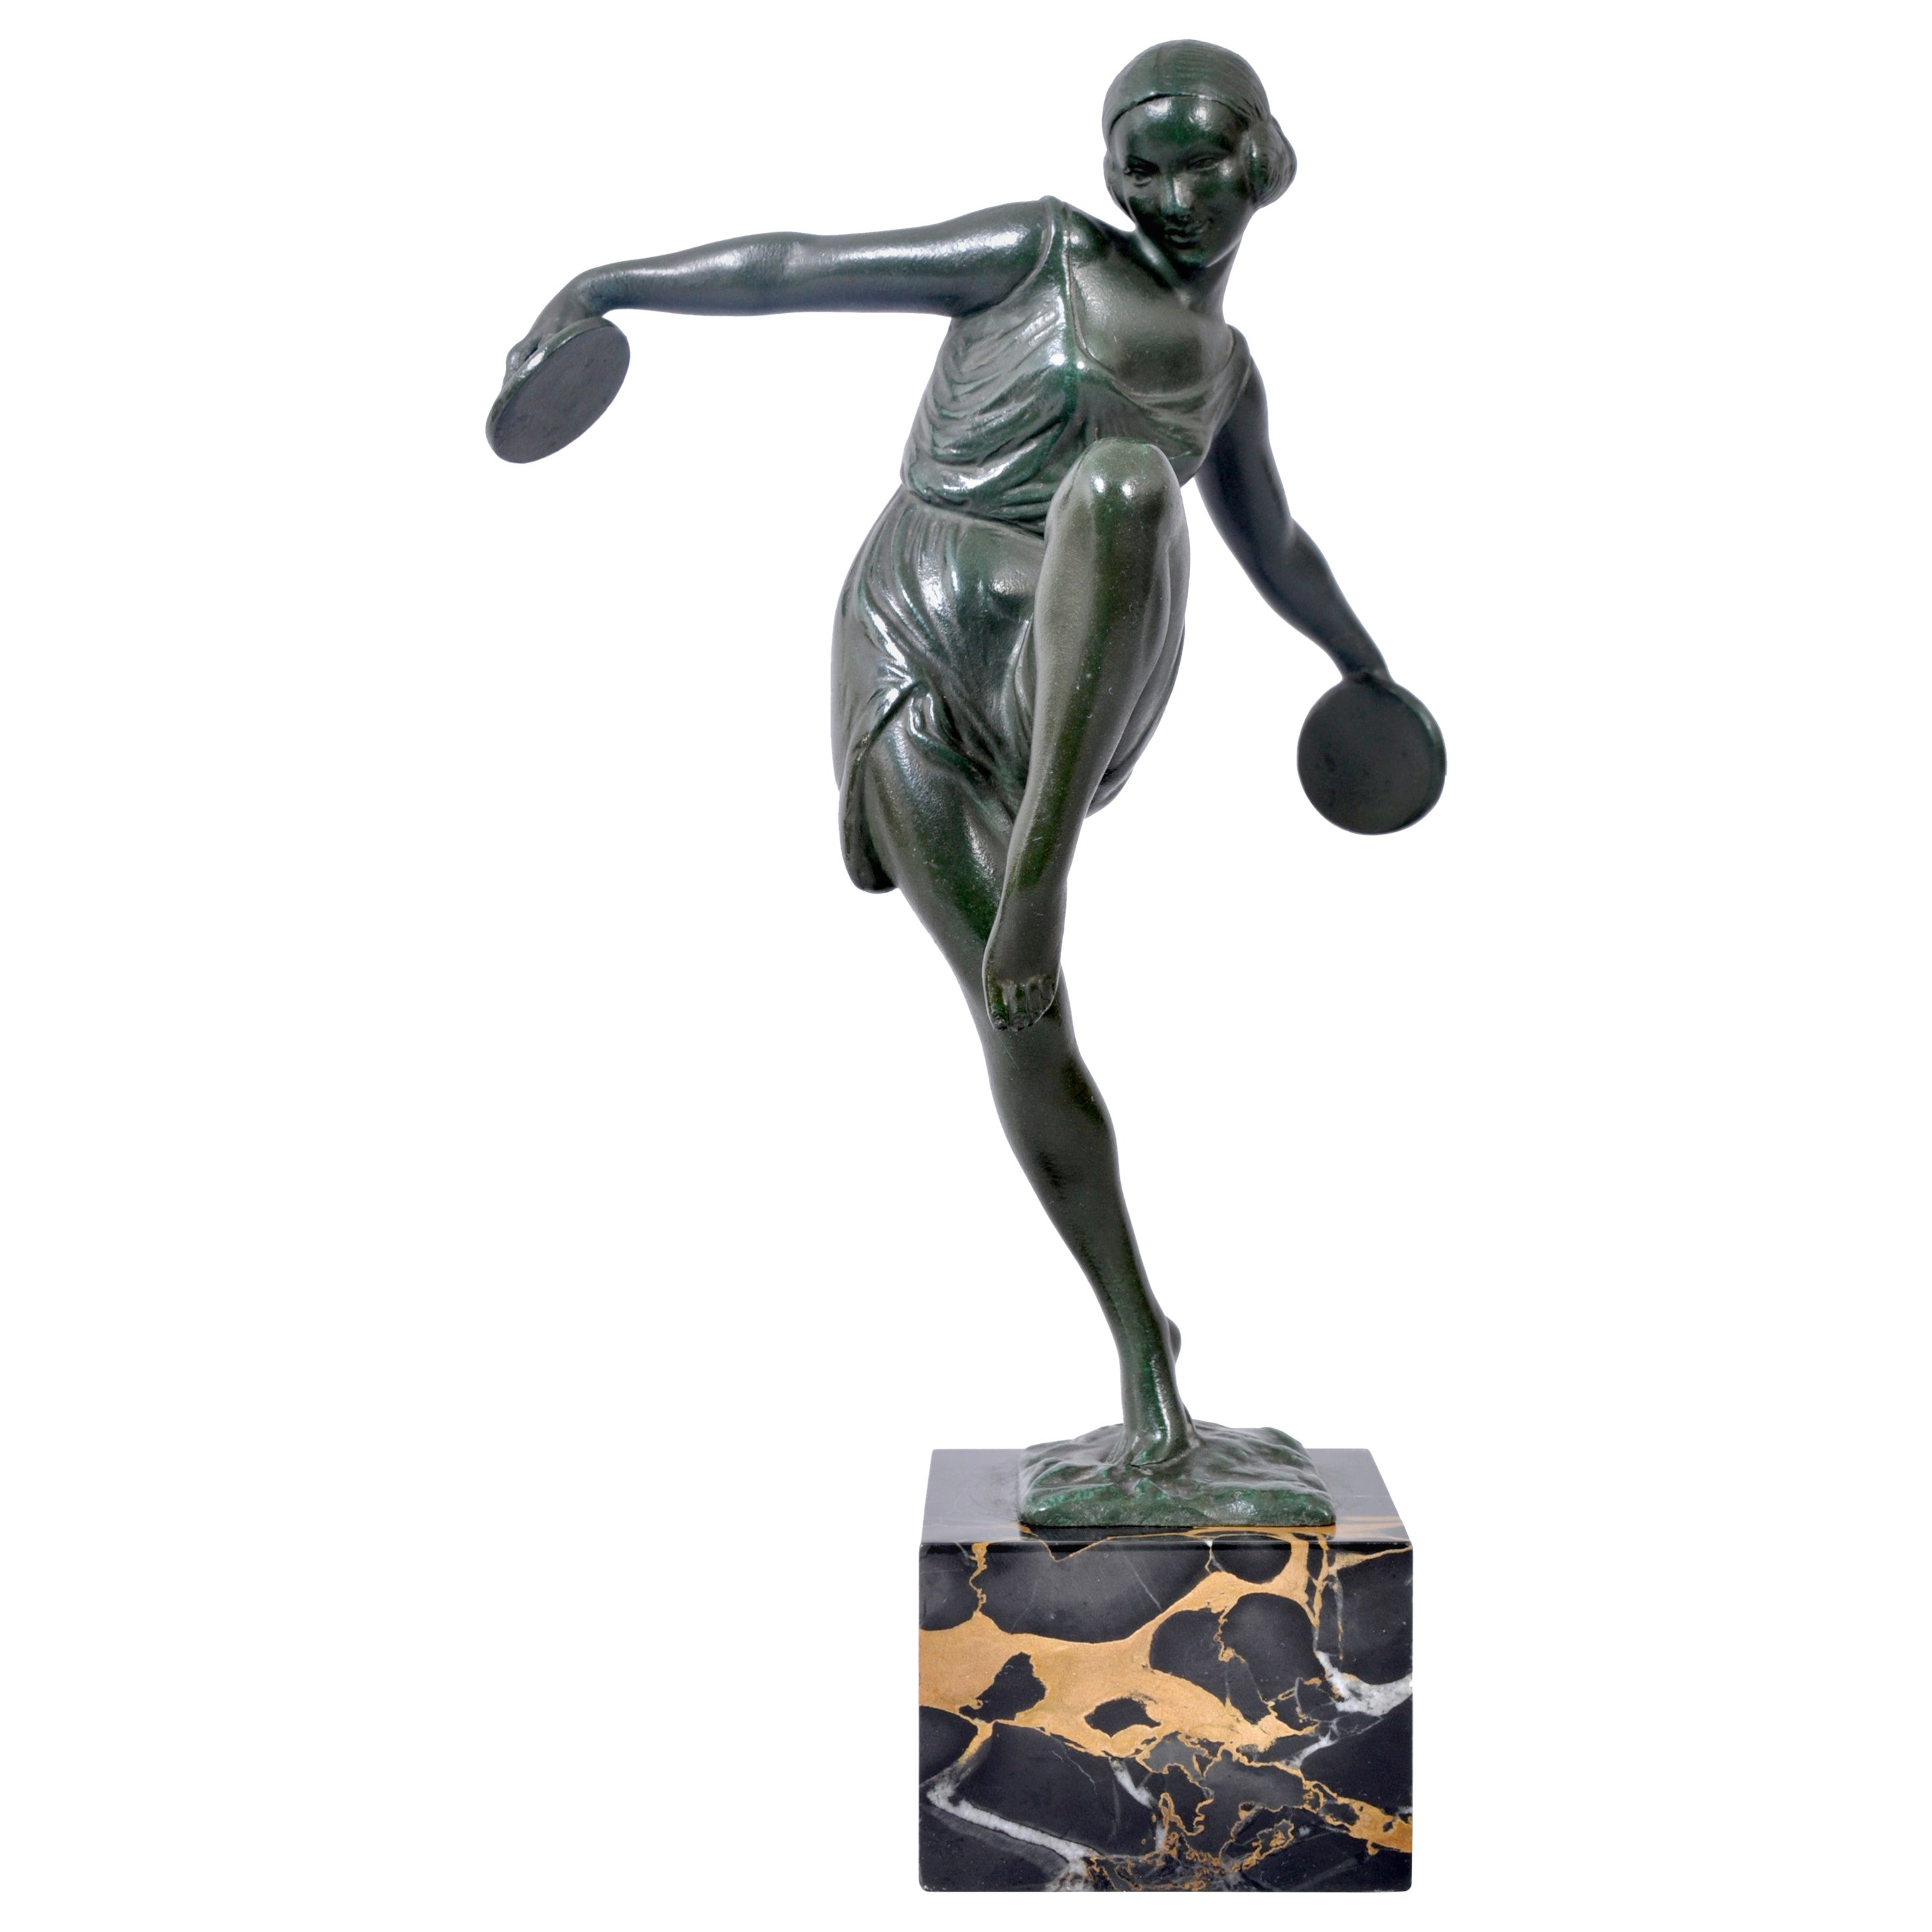 French Art Deco Bronze Female Cymbal Dancer Statue Figure Pierre Le Faguays 1925